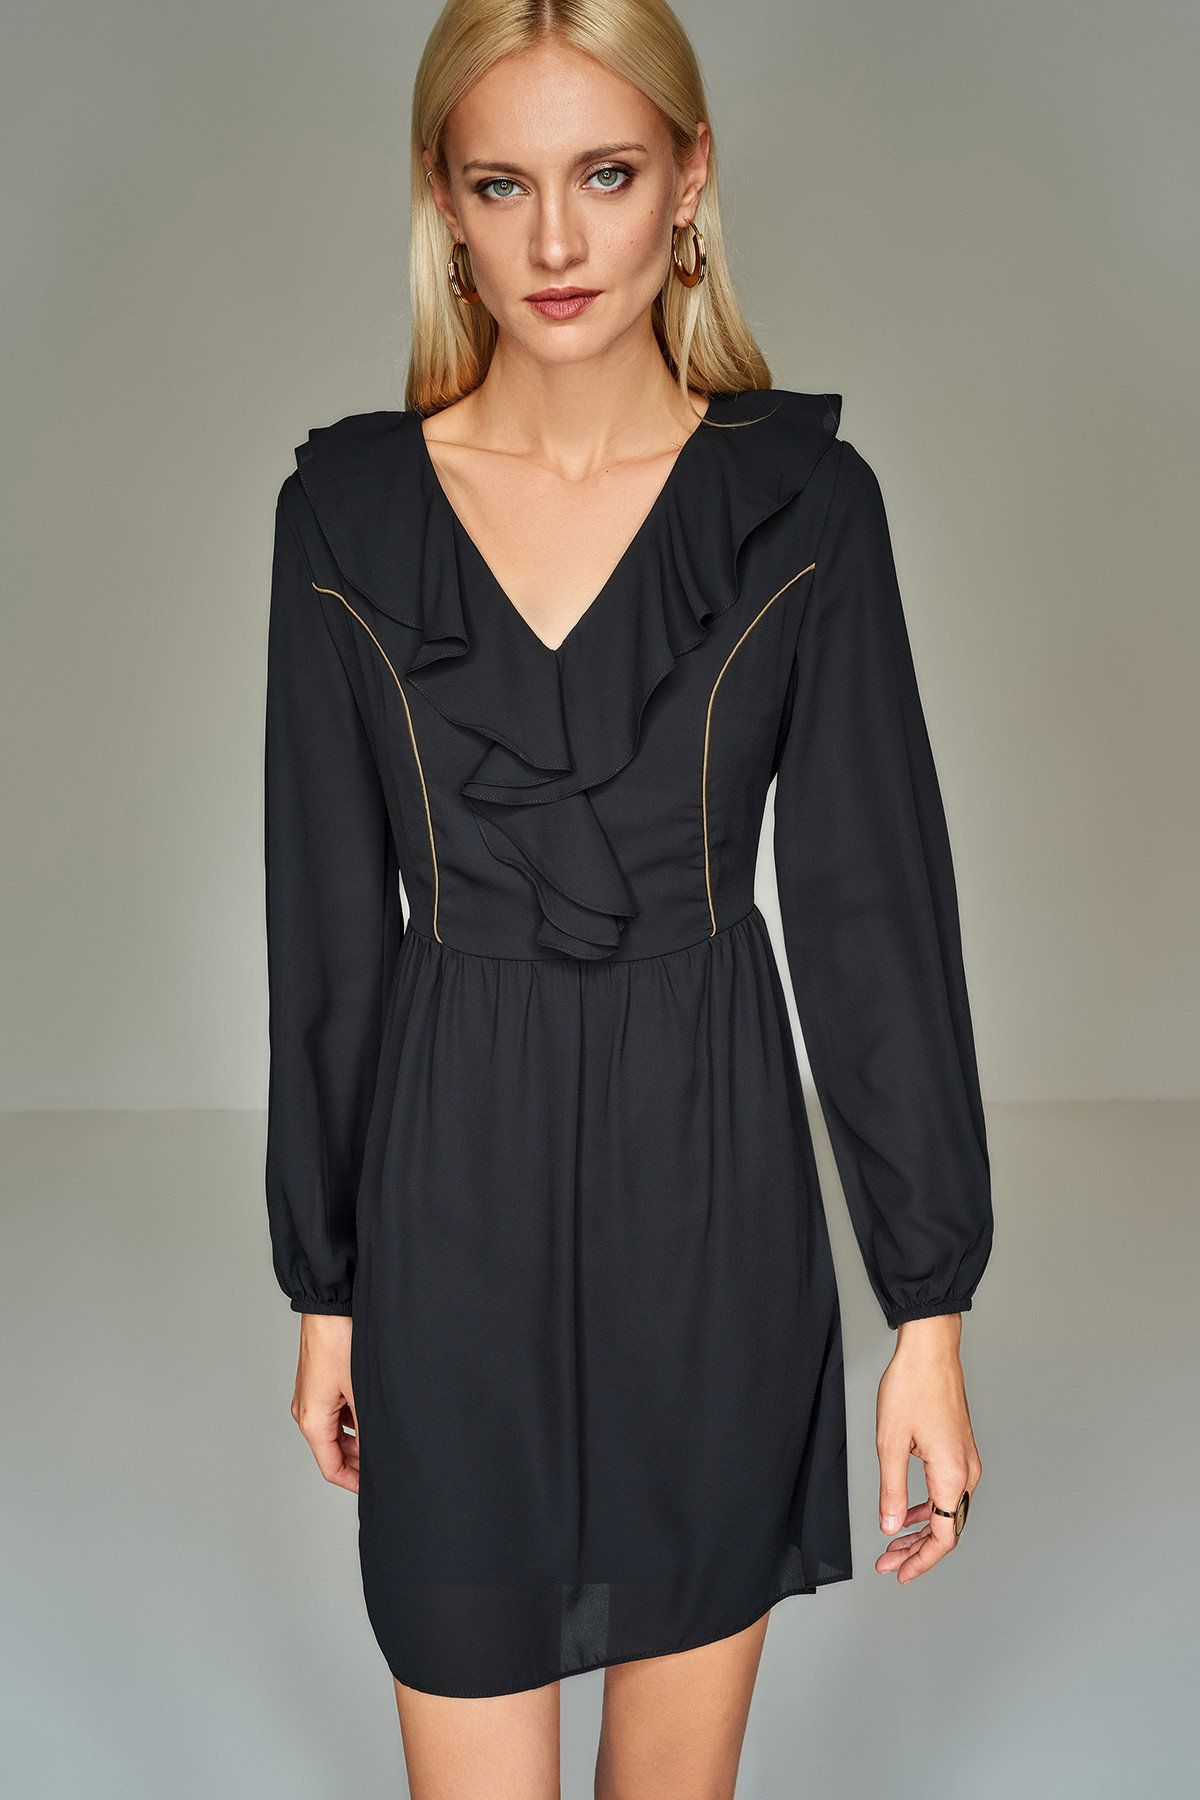 Siyah Yaka Detayli Gunluk Elbise Trendyolmilla Trendyol Elbise Elbise Modelleri Siyah